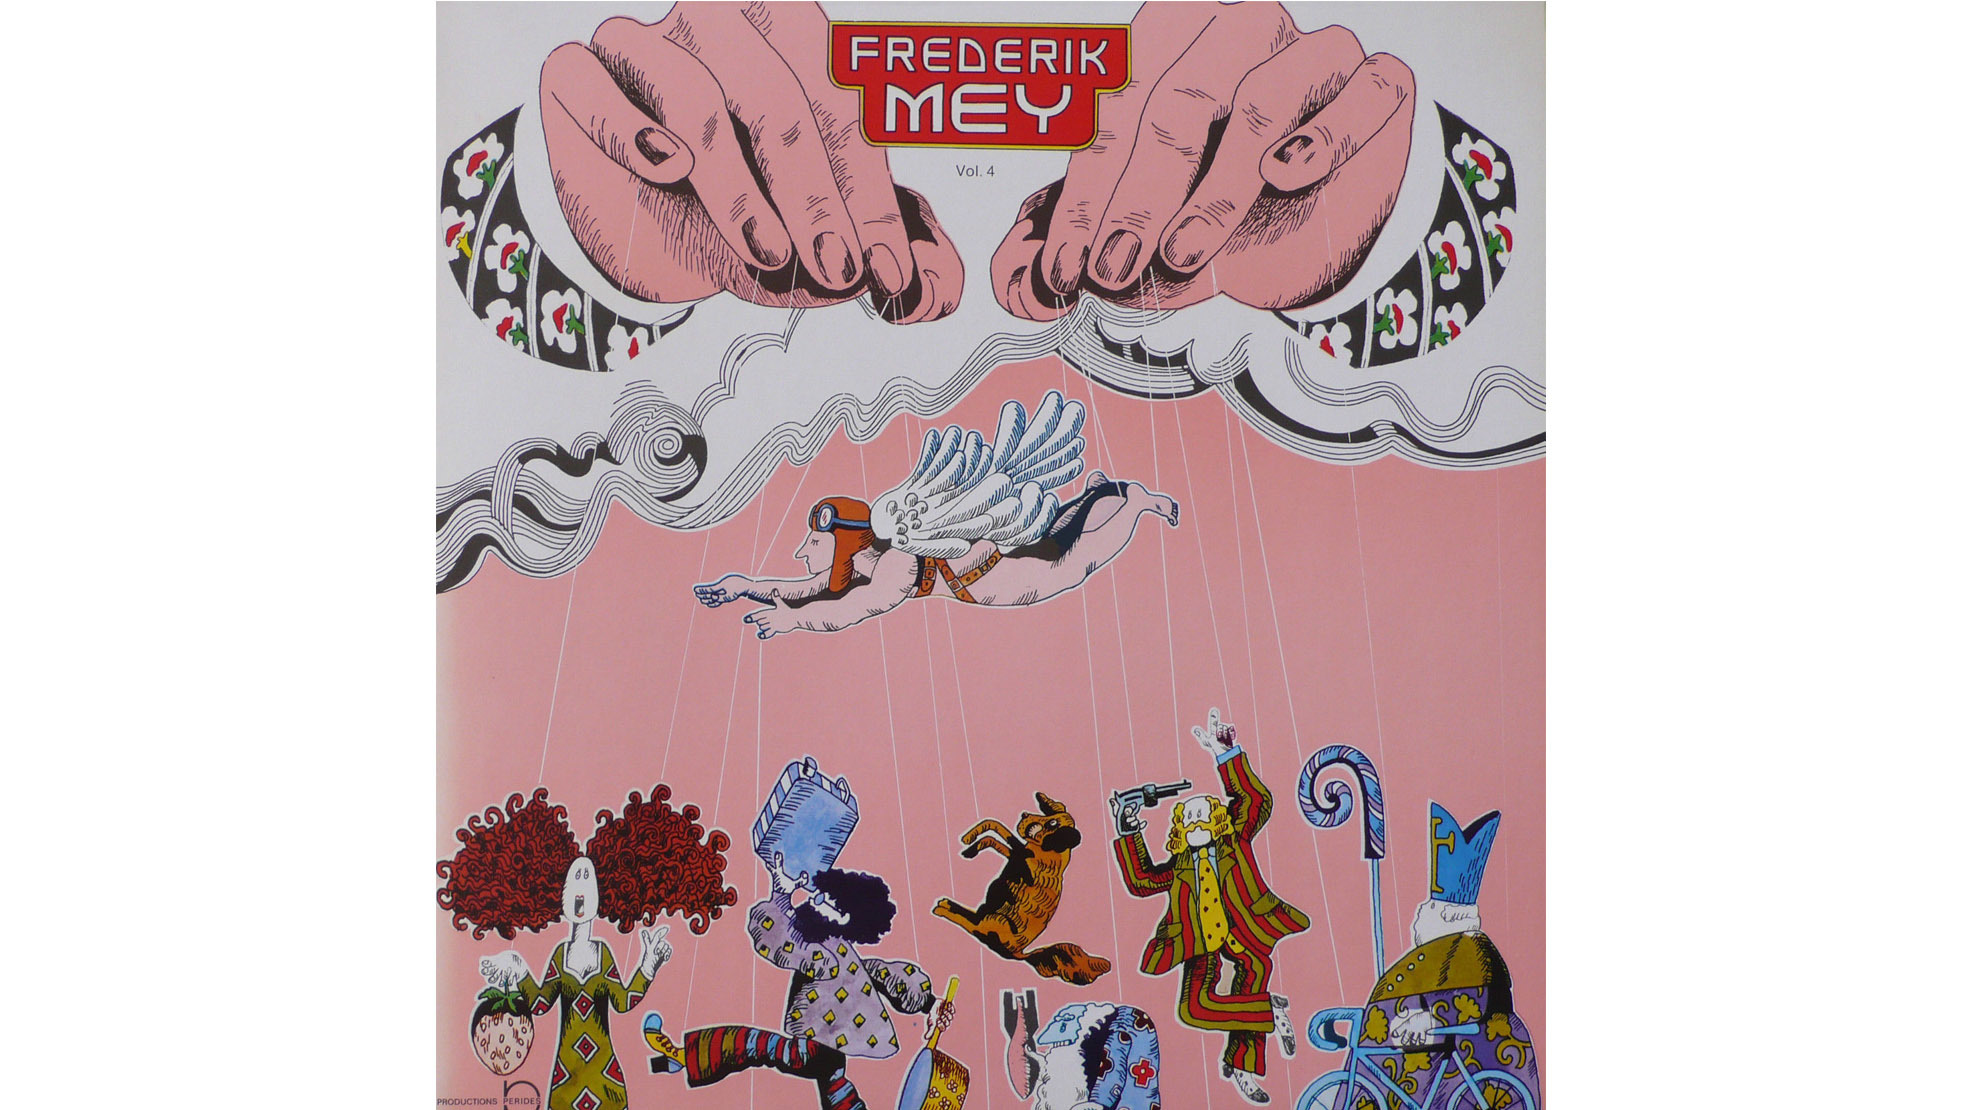 Frédérik Mey • Volume 4 (1976)